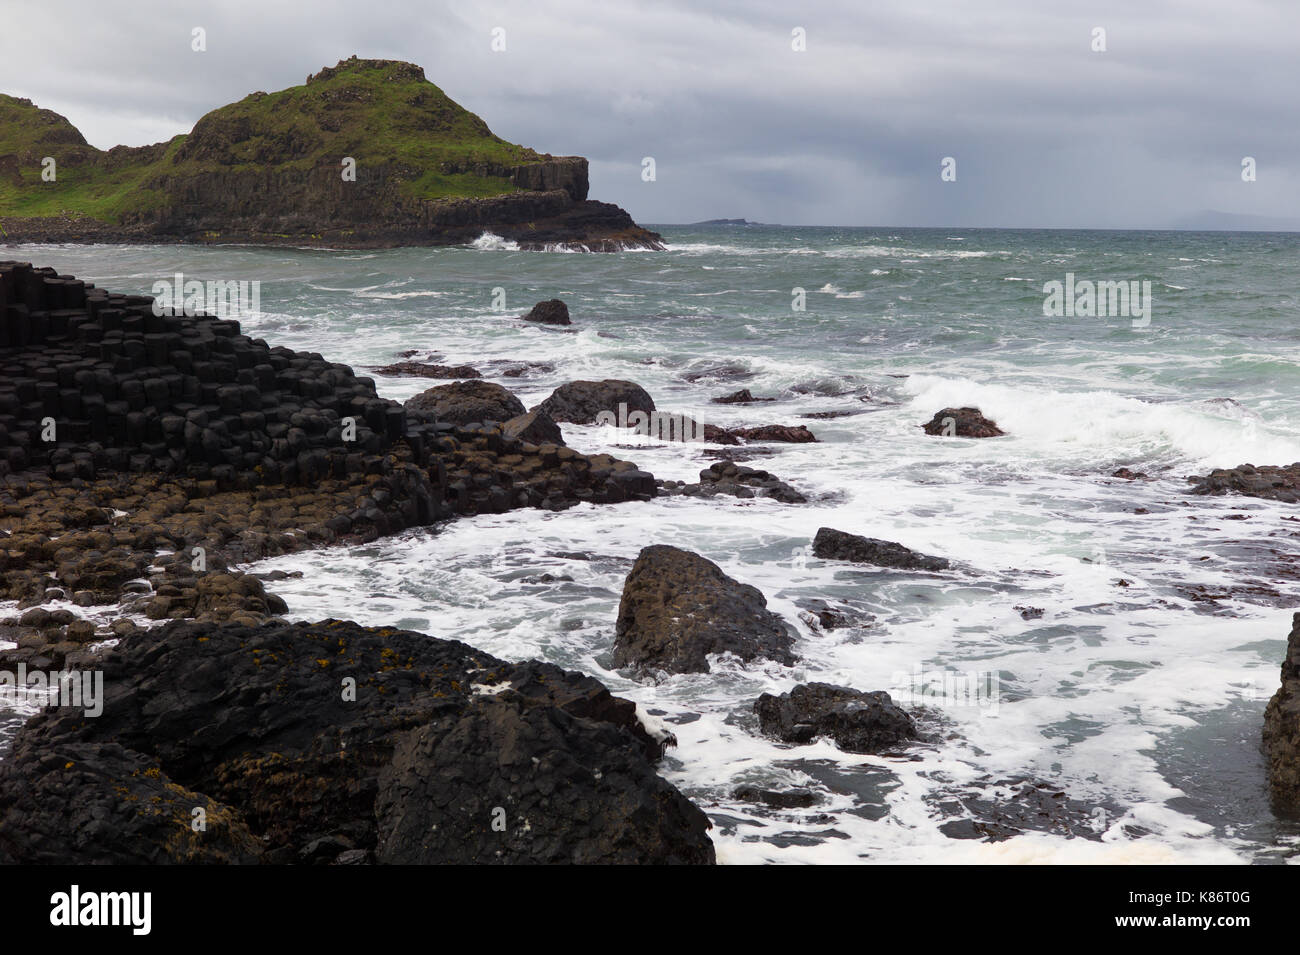 Giant's Causeway.Causeway Coastal Route, Northern Ireland - Stock Image